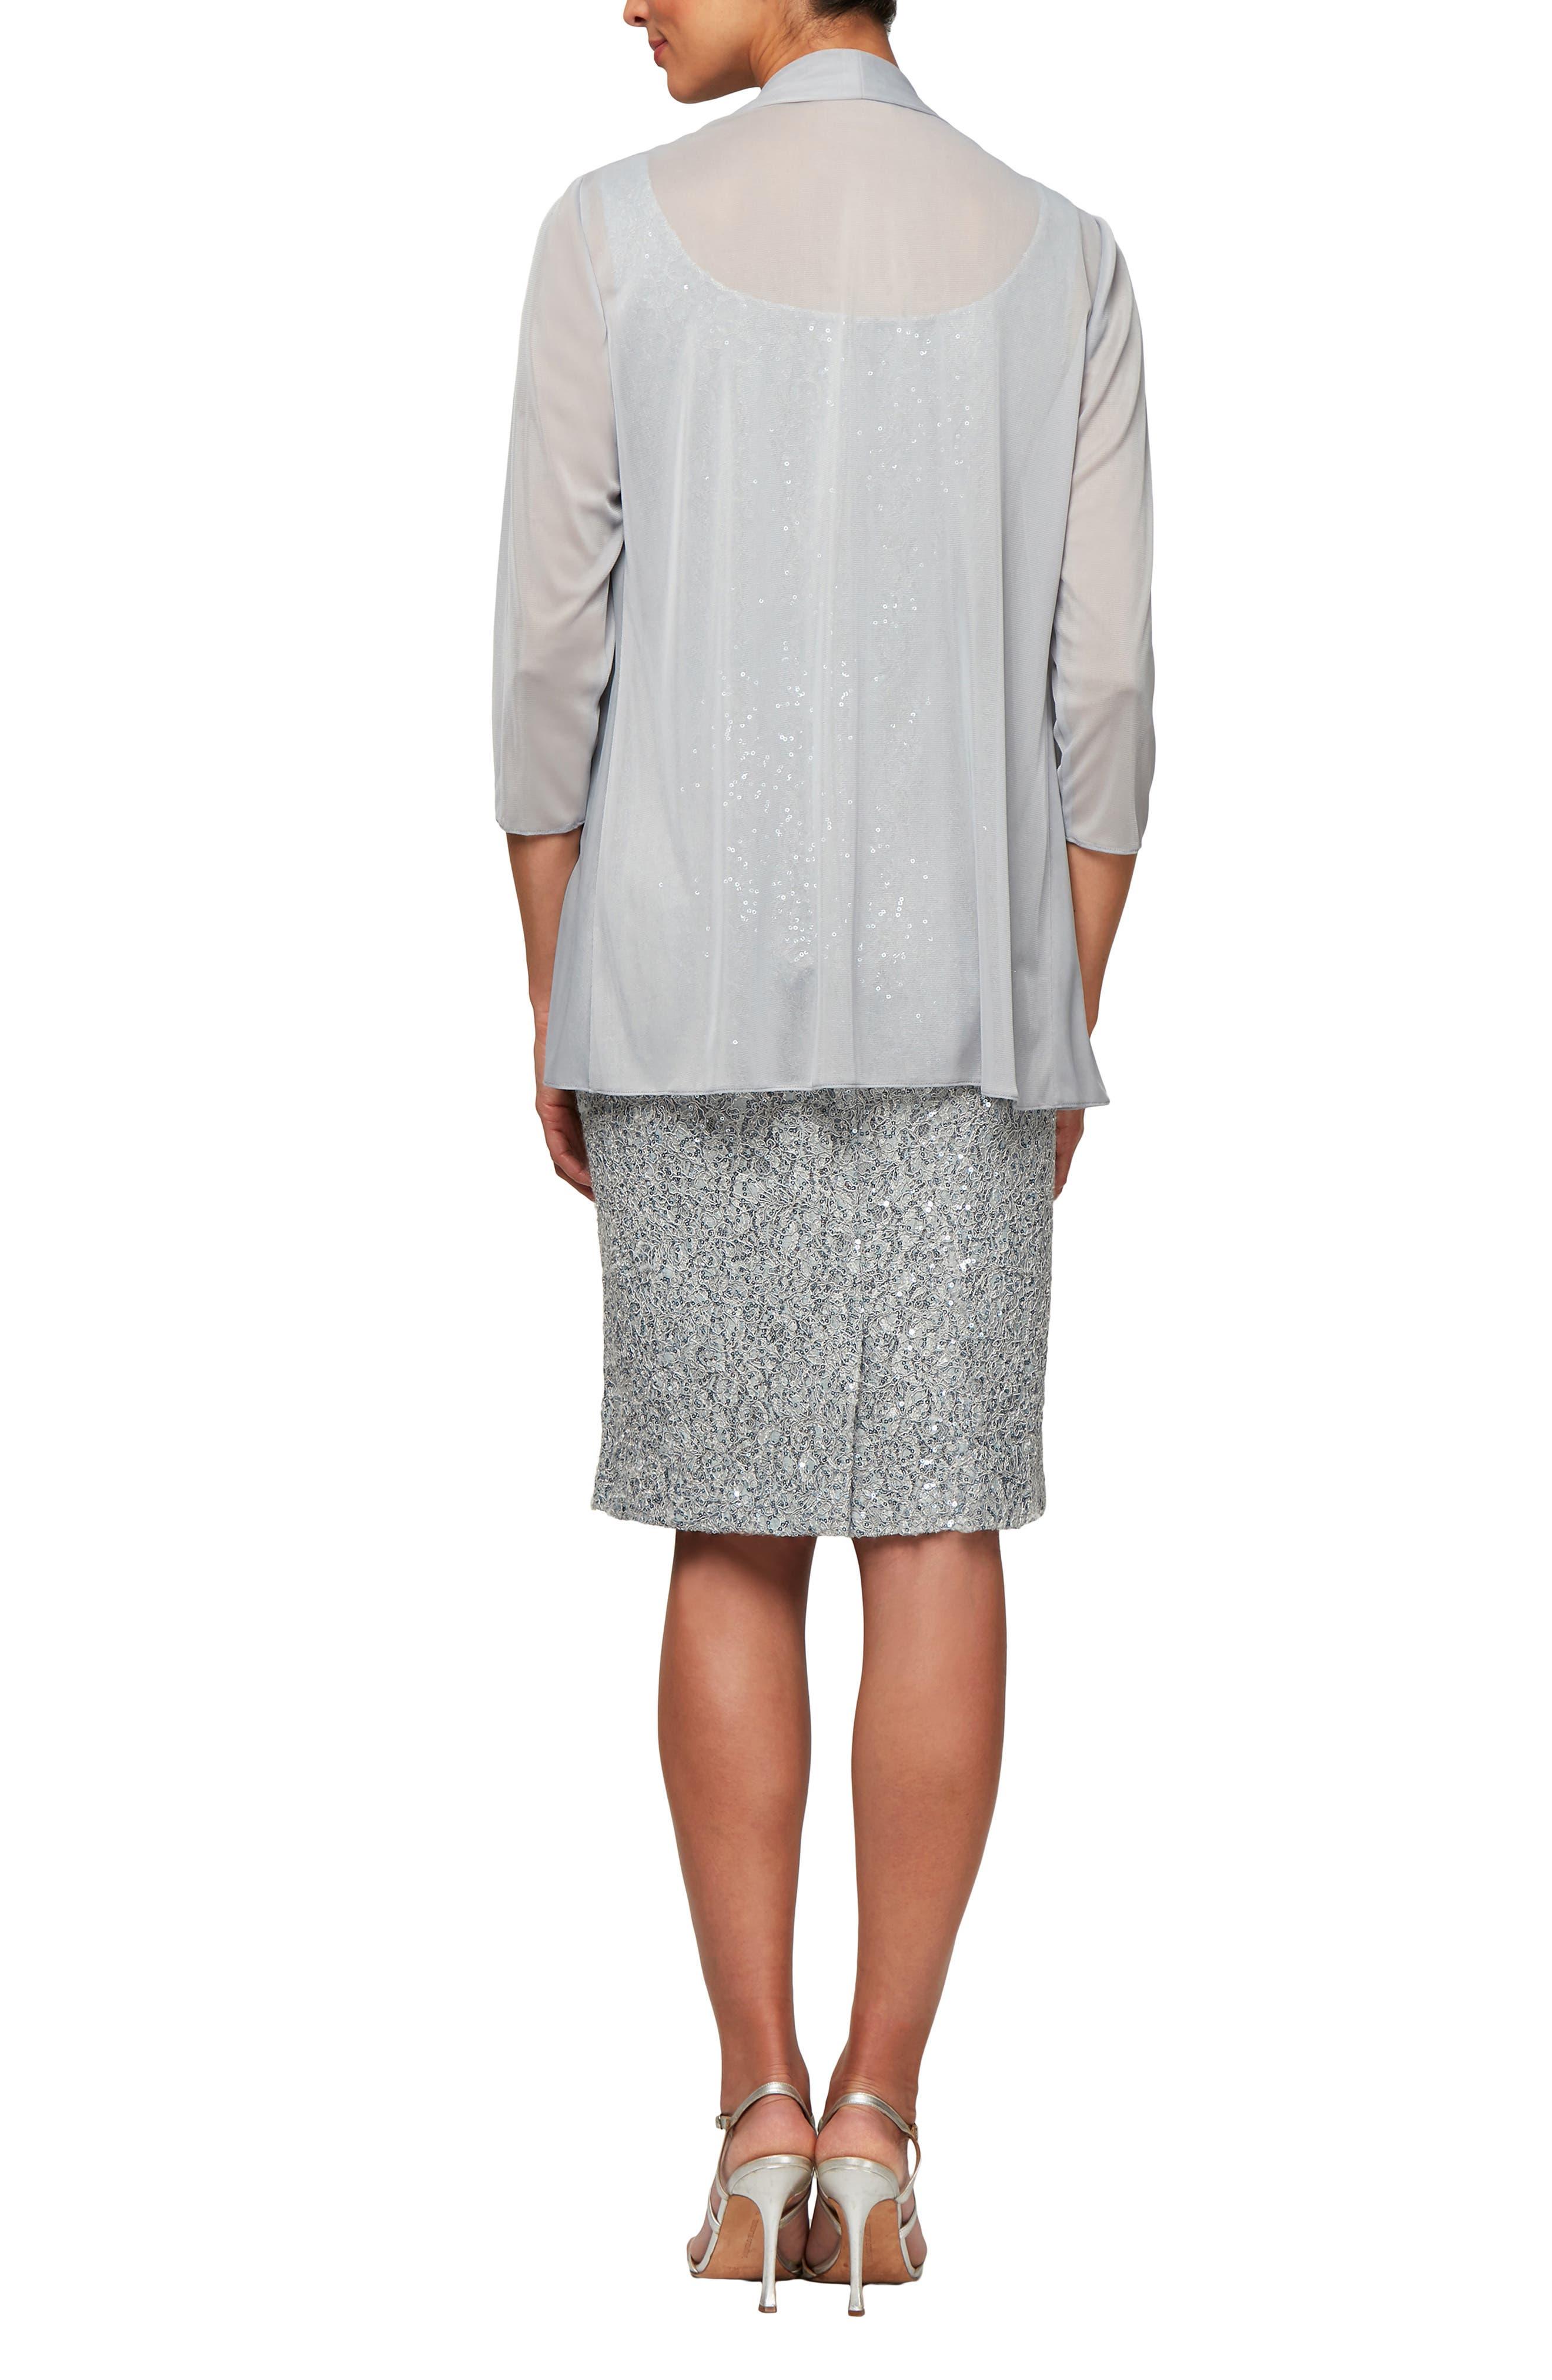 ALEX EVENINGS,                             Sequin Sheath Dress with Jacket,                             Alternate thumbnail 2, color,                             LIGHT BLUE